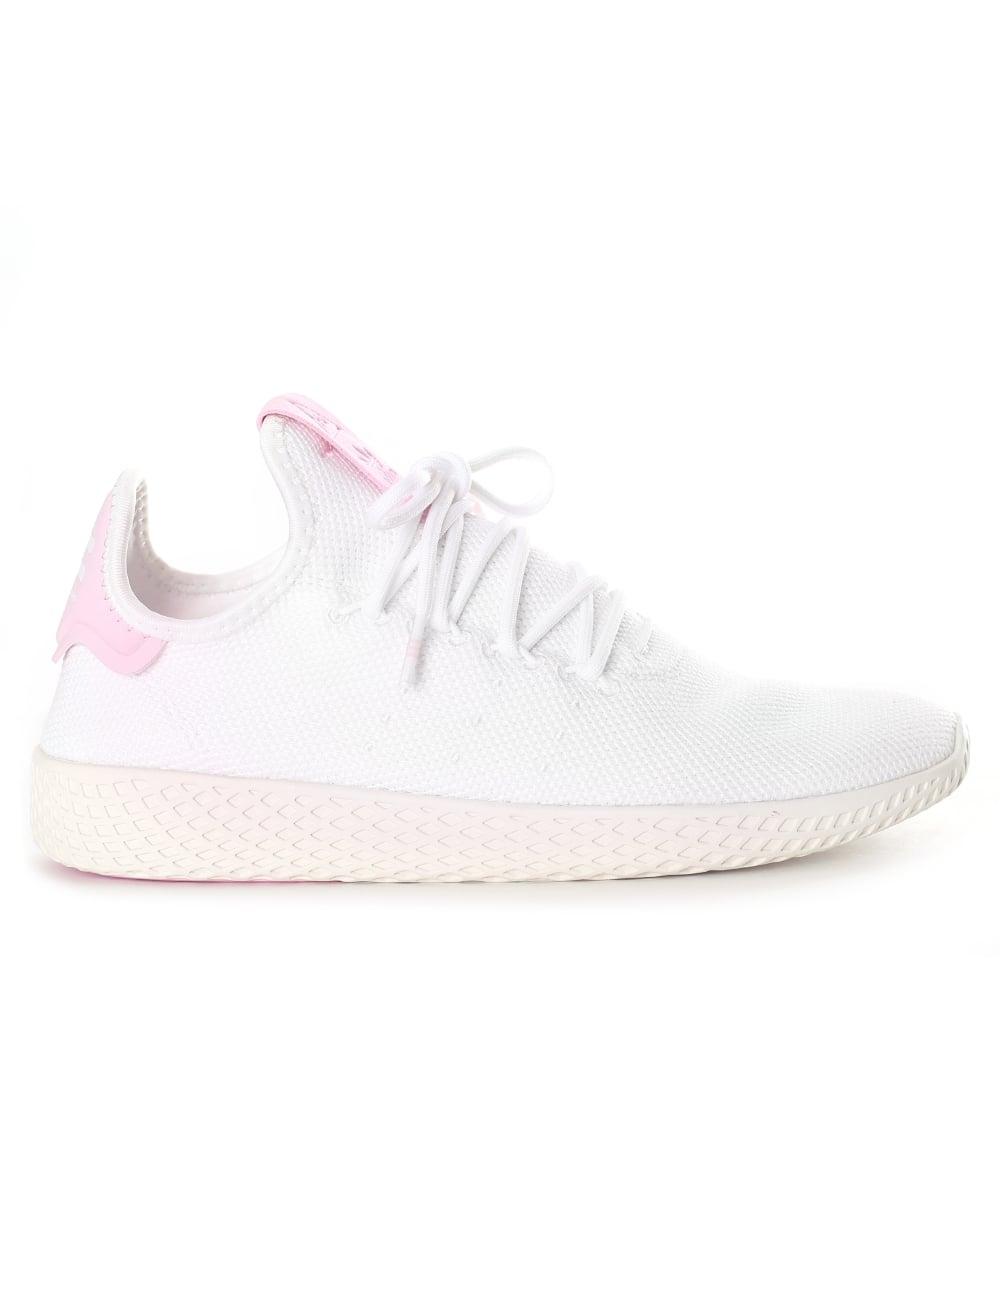 buy online f1e73 9fc76 Originals Pharrell Williams Tennis Hu sneaker